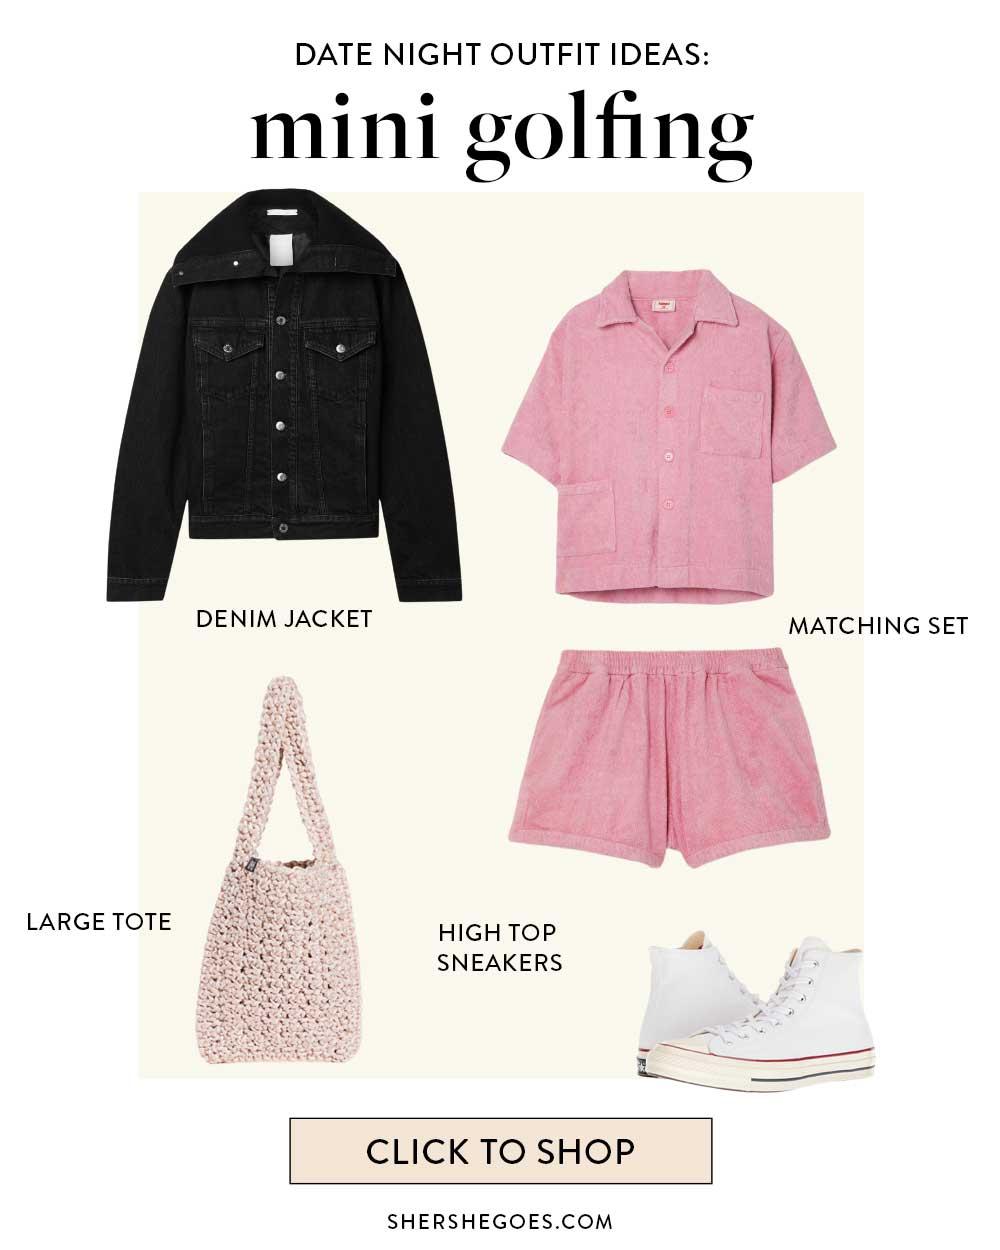 casual-date-night-outfit-mini-golf